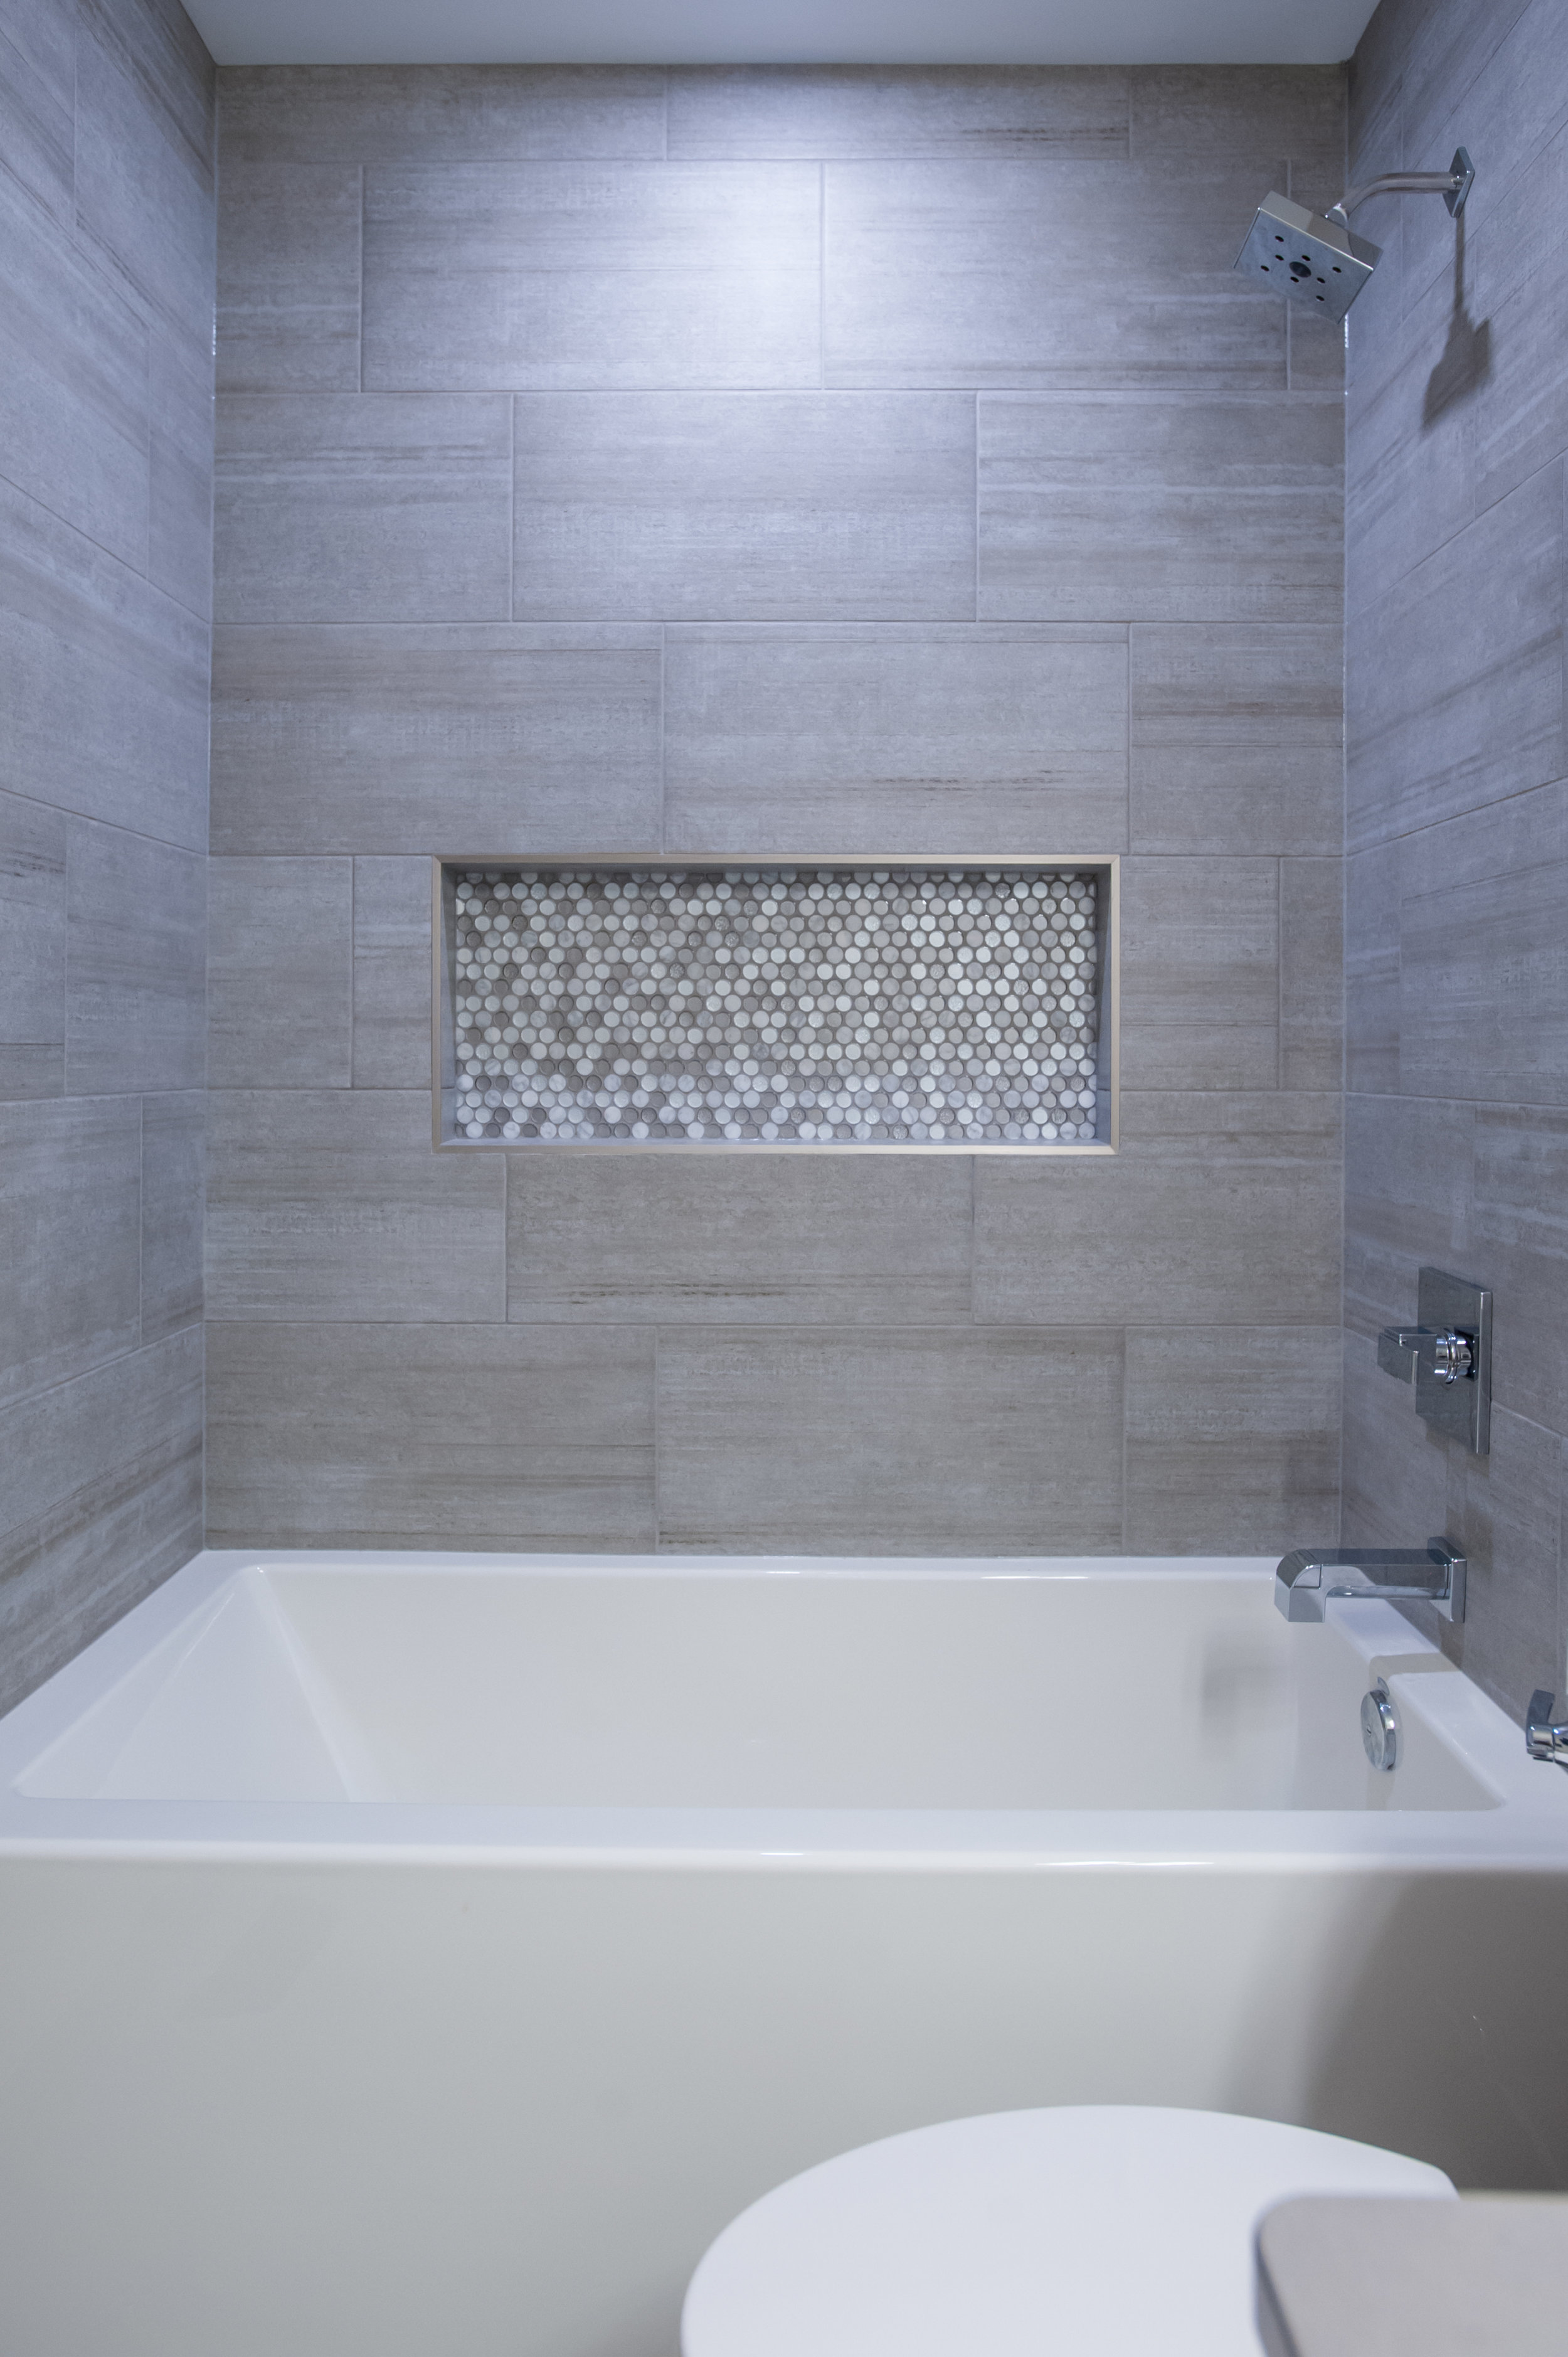 bath_surround_pennyround_tile